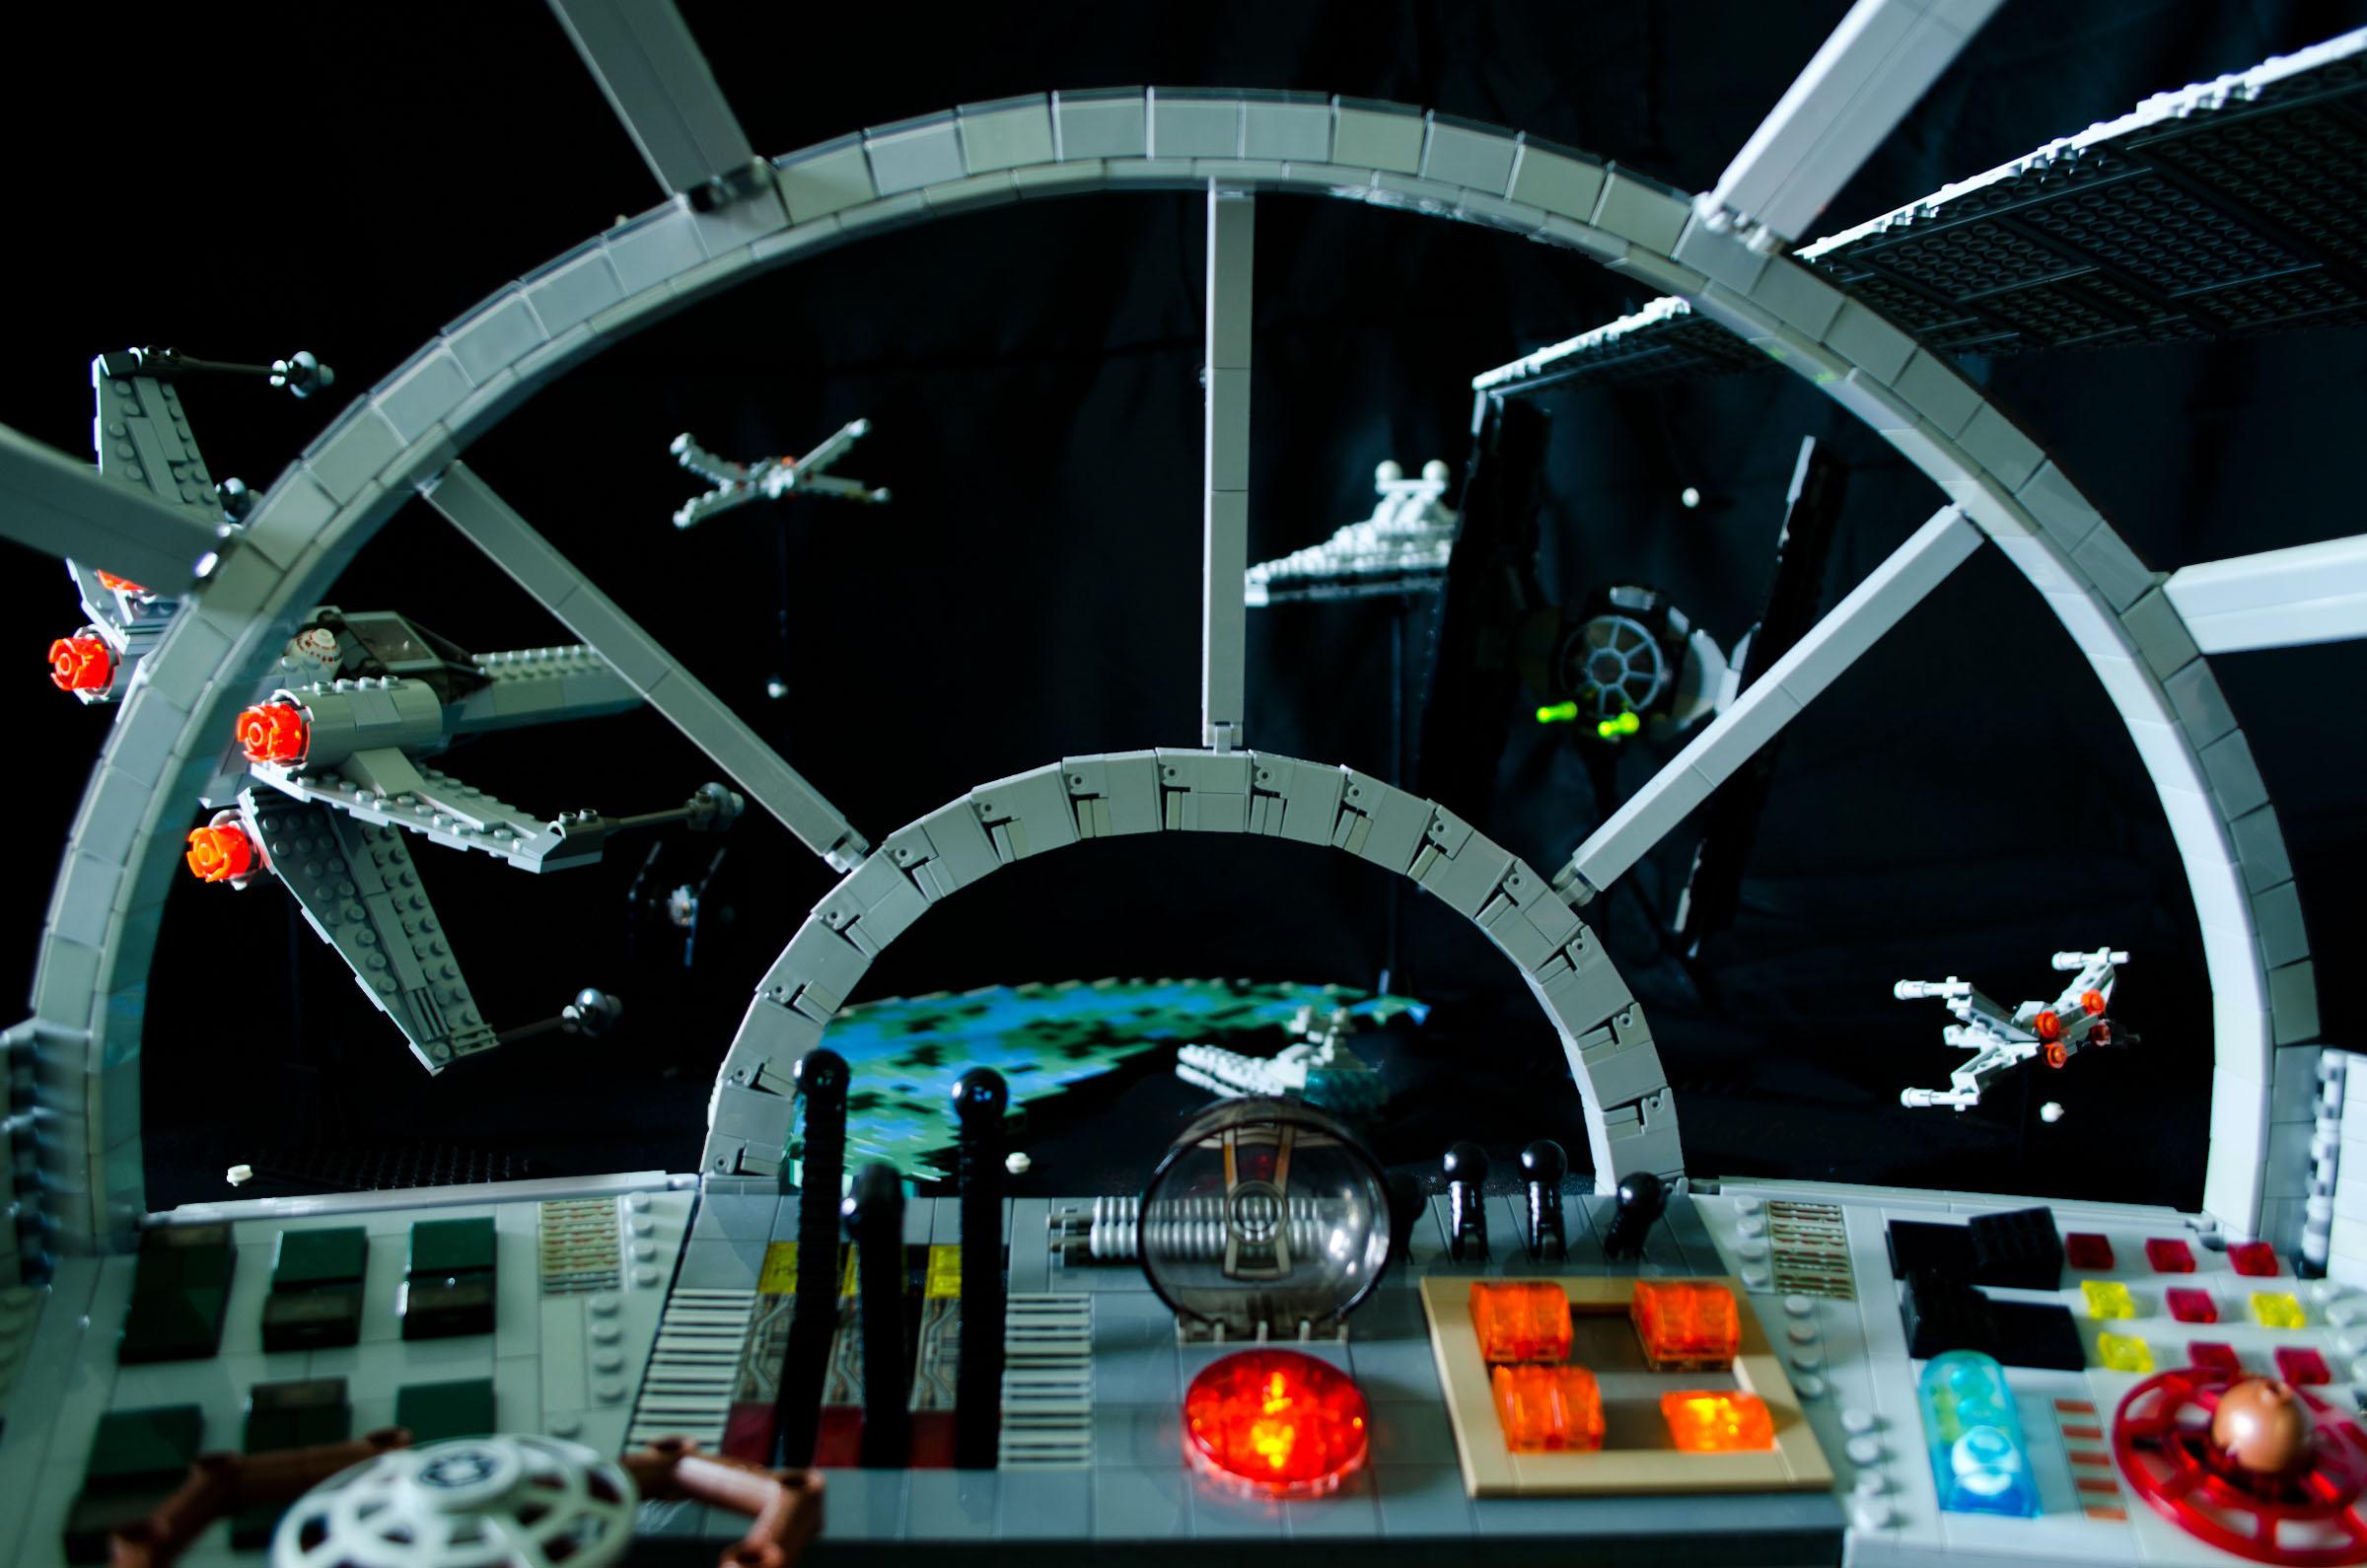 Wars Bären wallpaper war fighter ship lego space wing